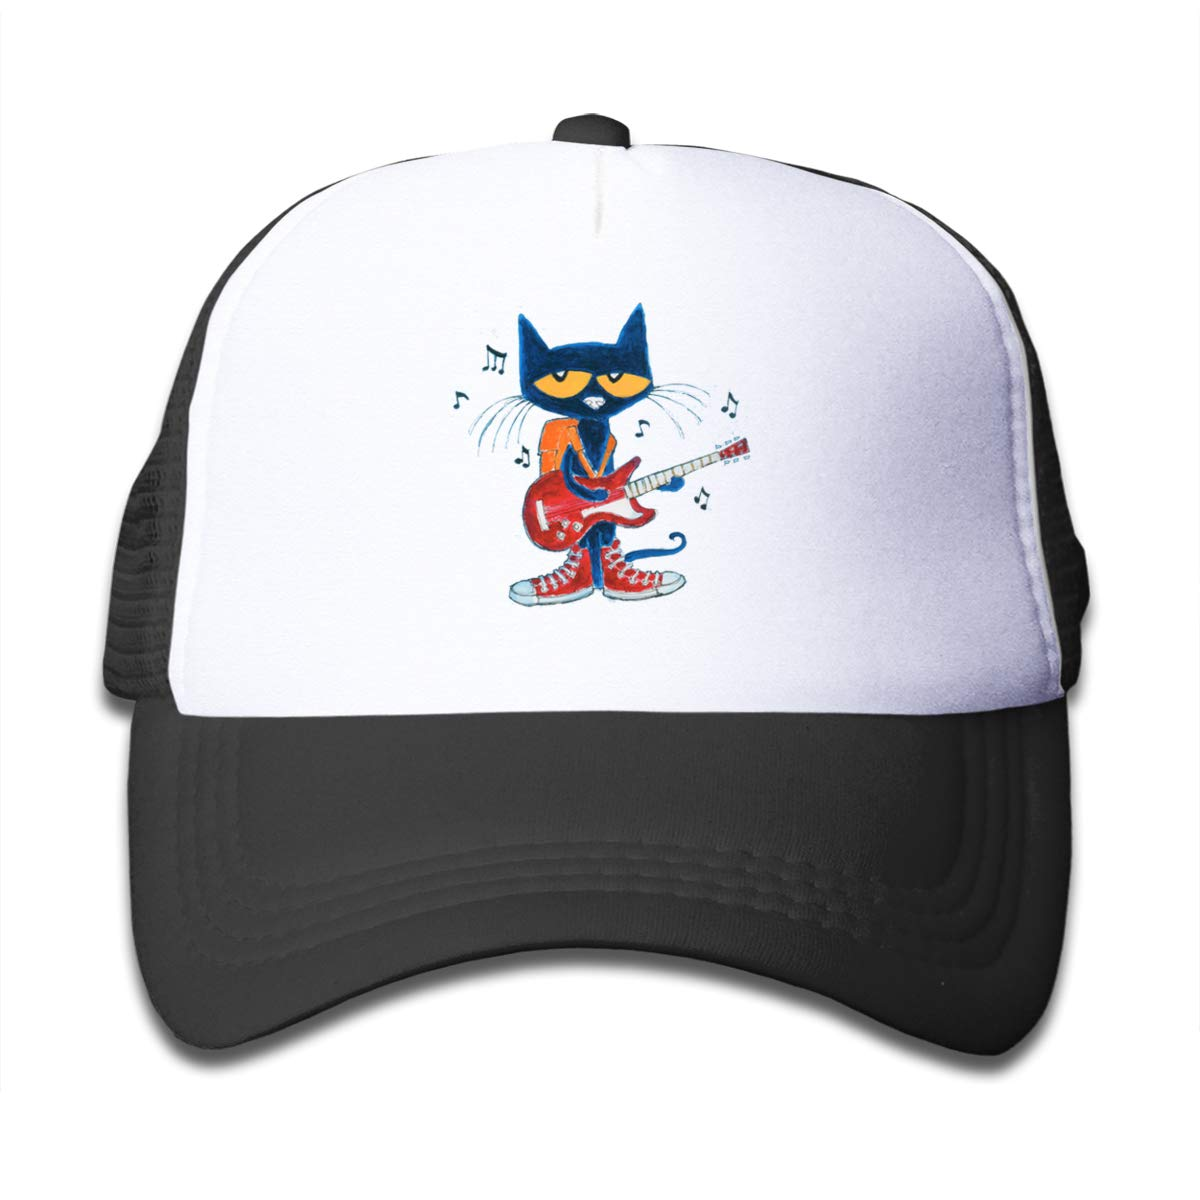 Lets Talk About PETE The Blue CAT Guitar Mesh Baseball Cap Kids Trucker Hats